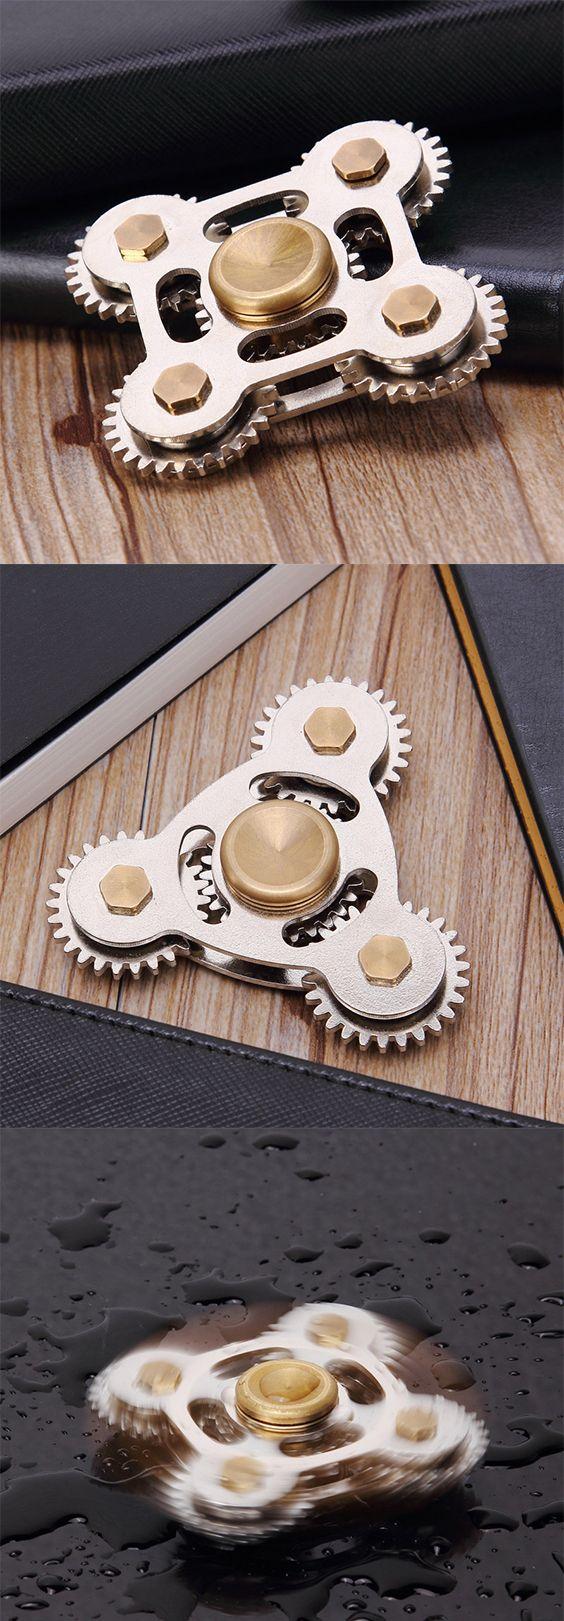 Stress Relief Toy Gears Fingertip Fidget Spinner